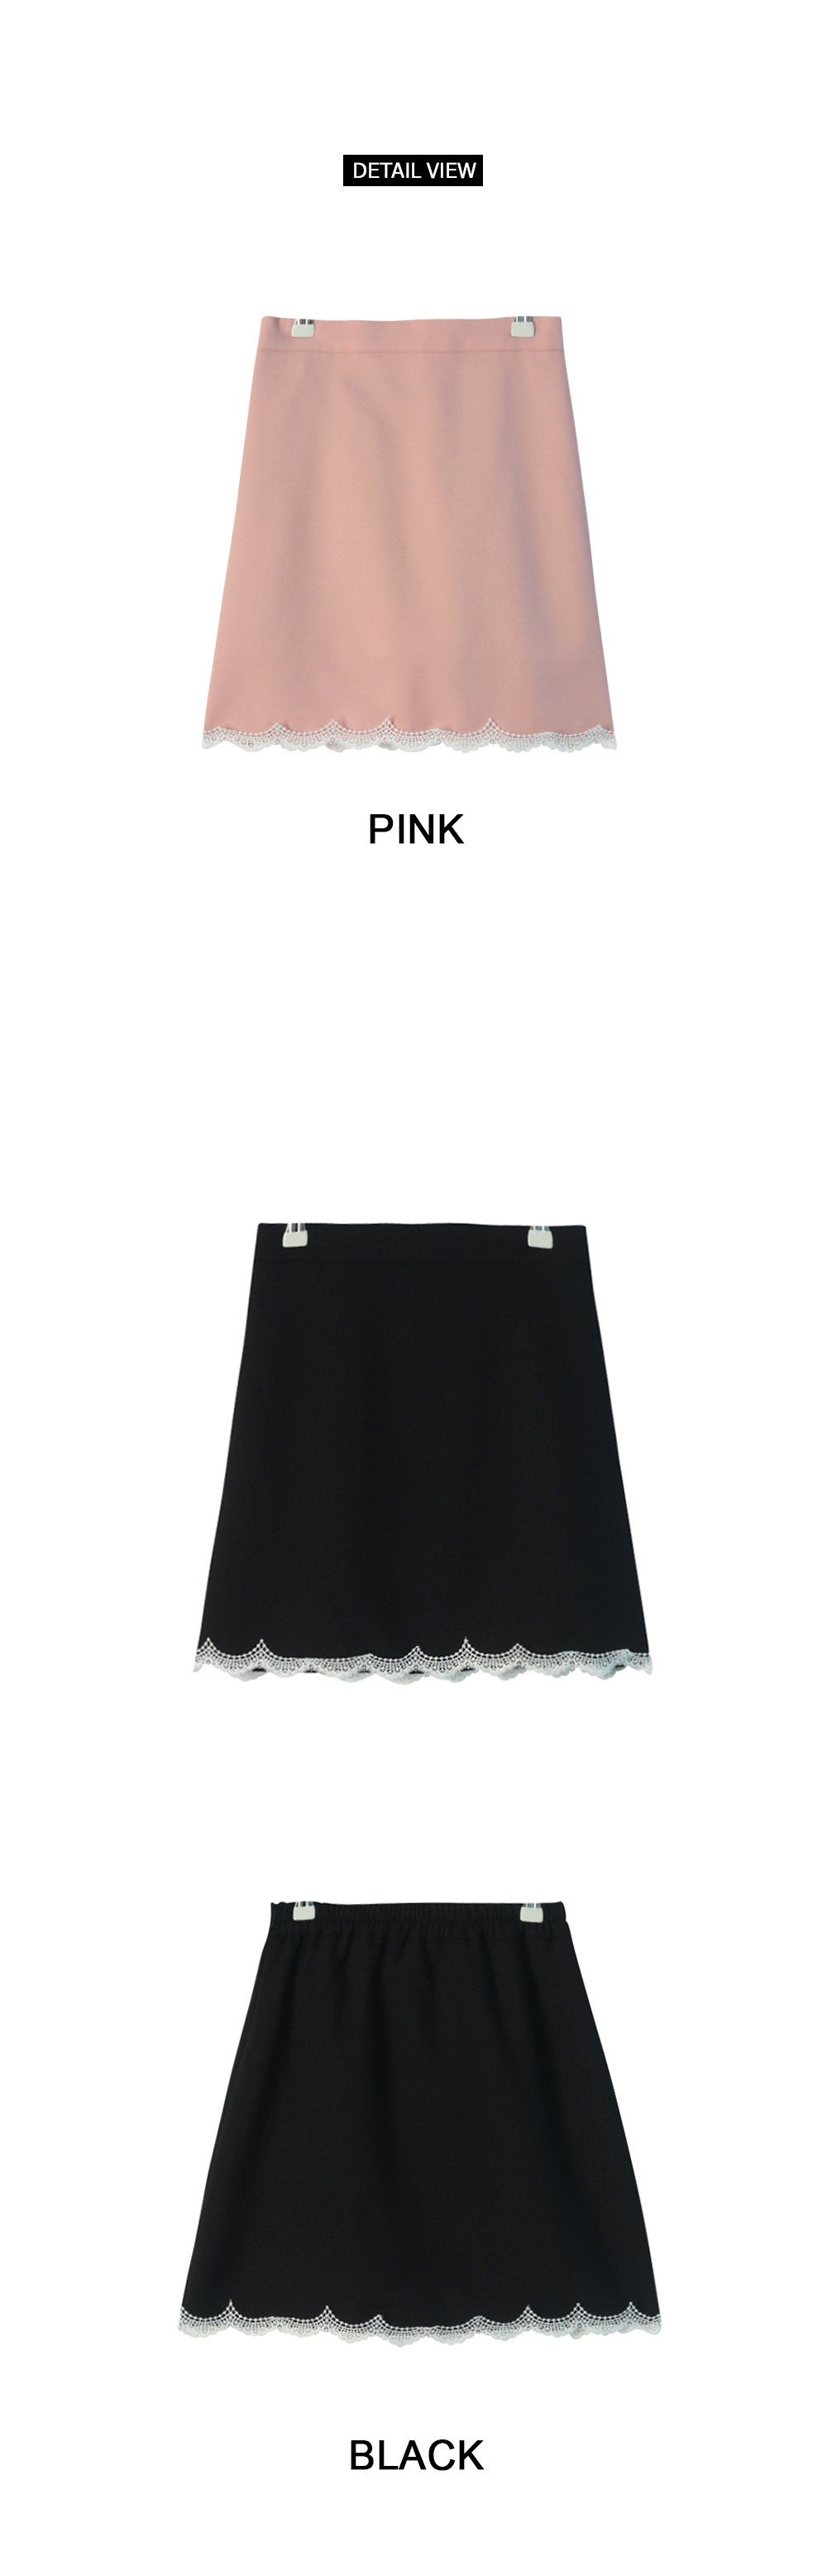 Choice lace skirt